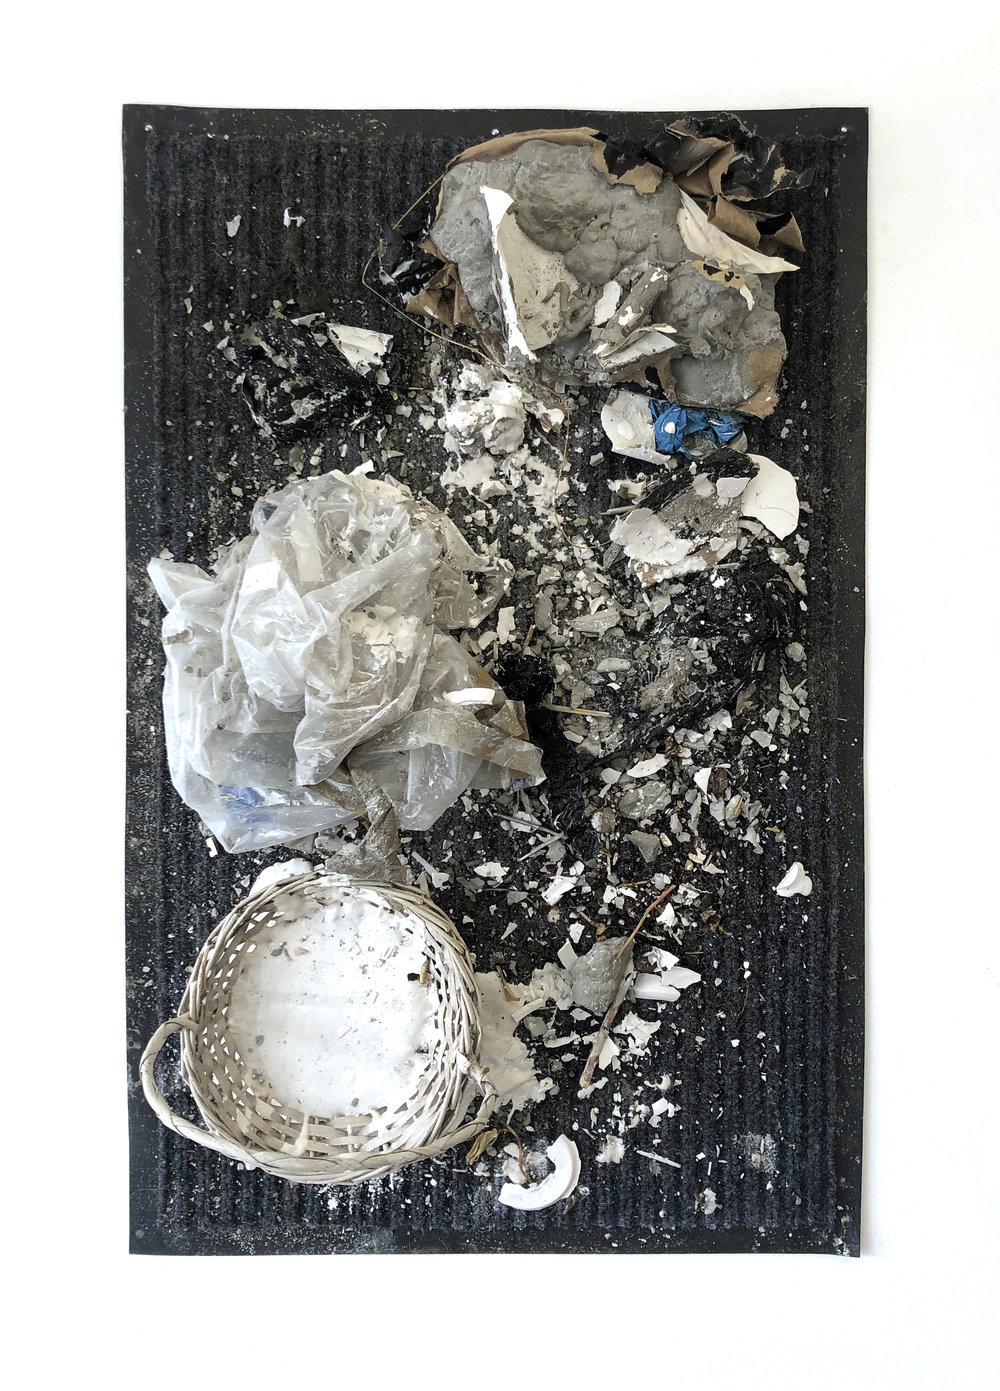 Tableau , 2018 rug, basket, Hydrocal, studio debris 31-1⁄2 x 19-1⁄2 x 10 in